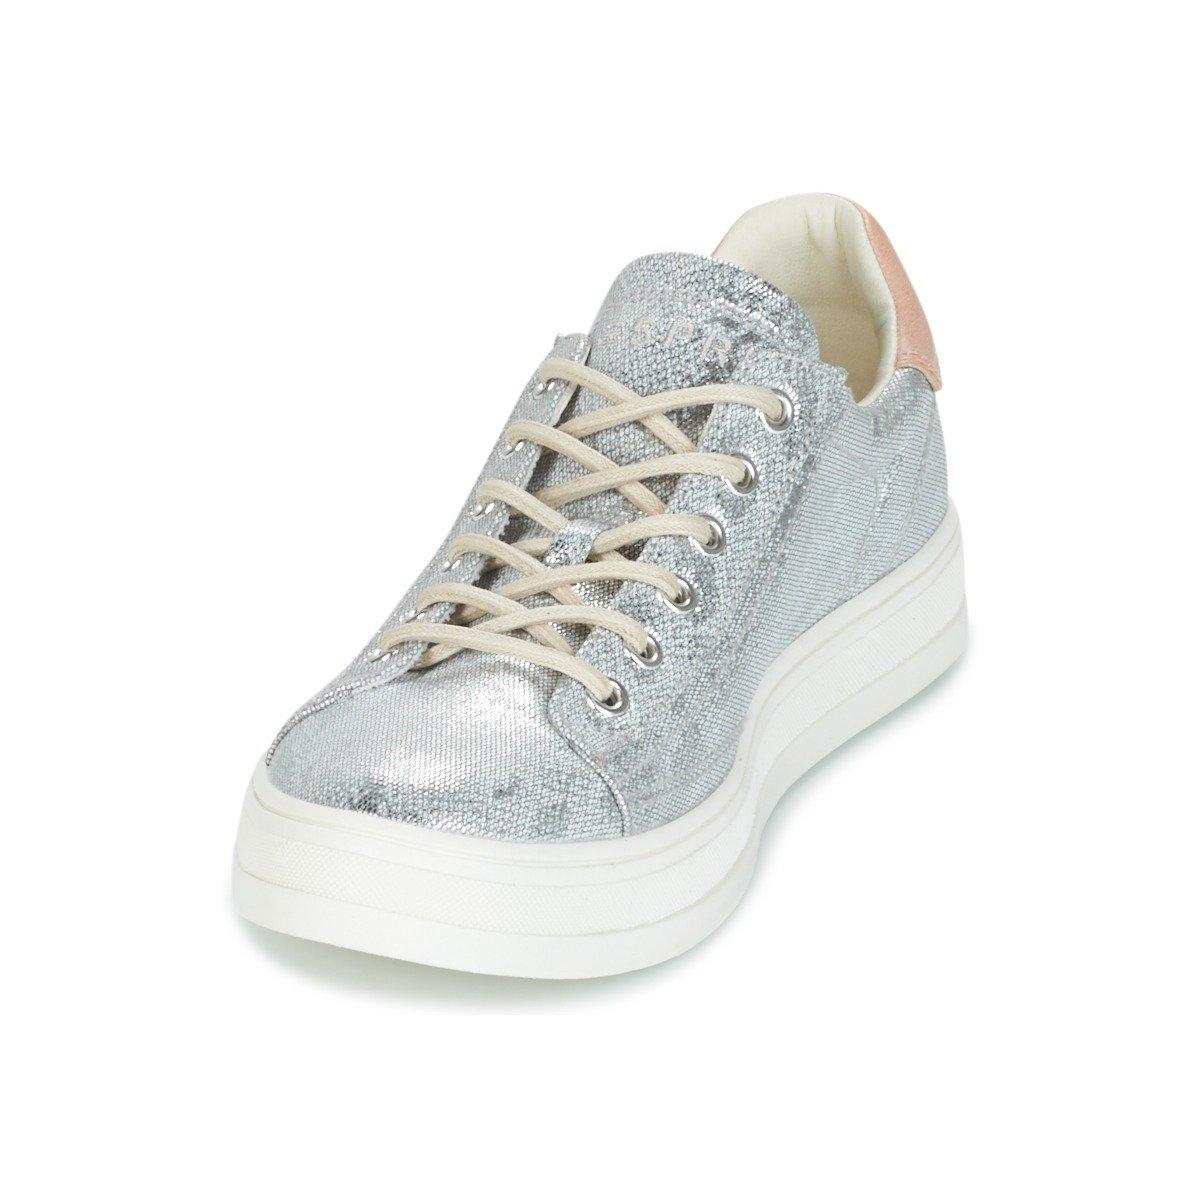 ESPRIT Damen Simona Lace Lace Simona Up Sneaker Grau 72ba8d